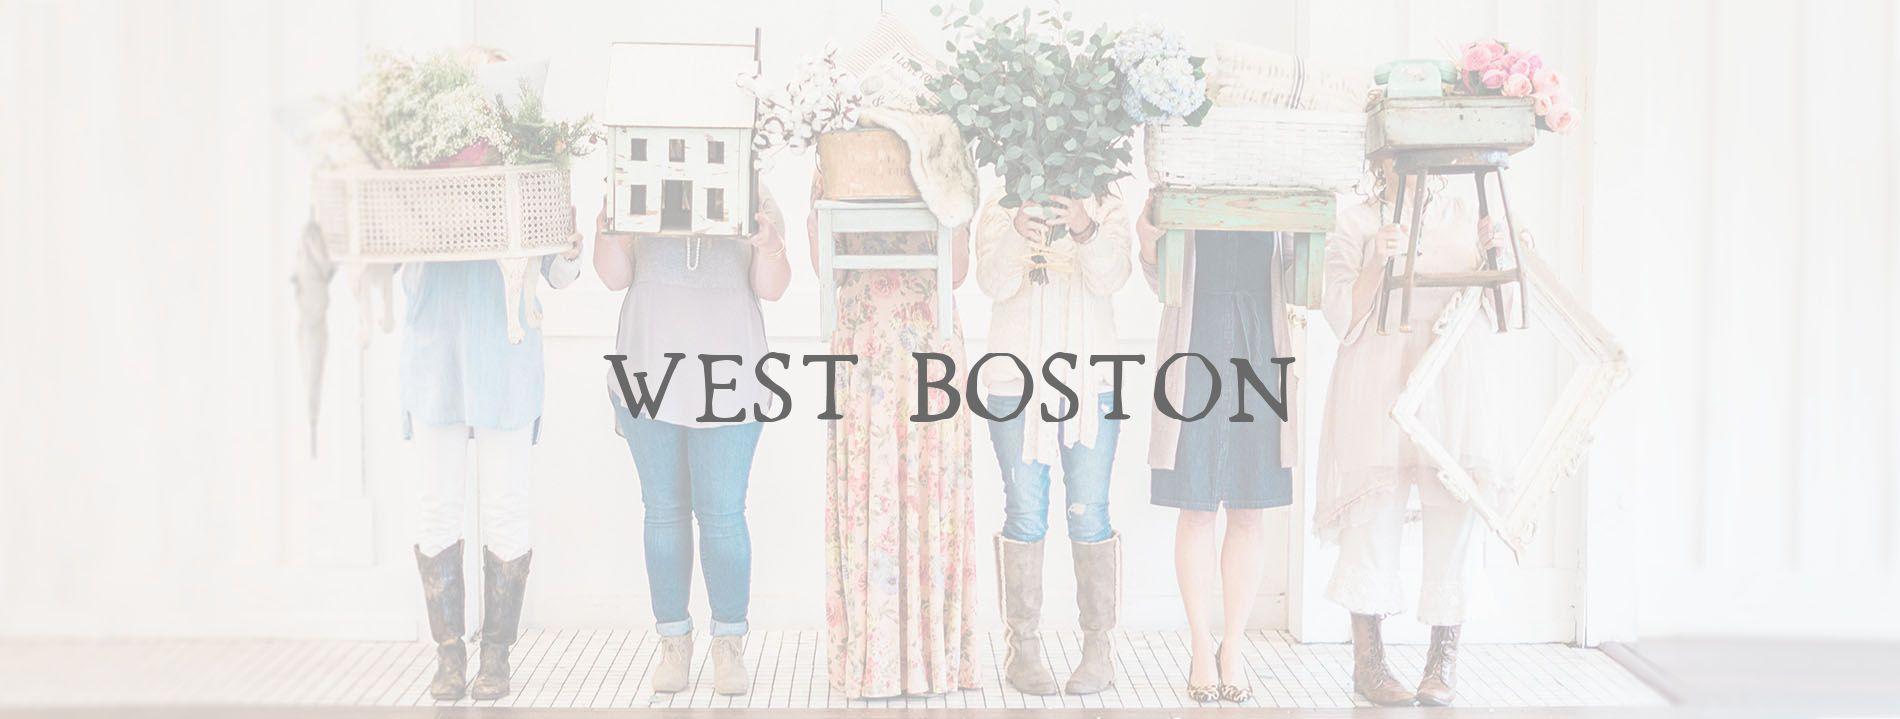 West Boston